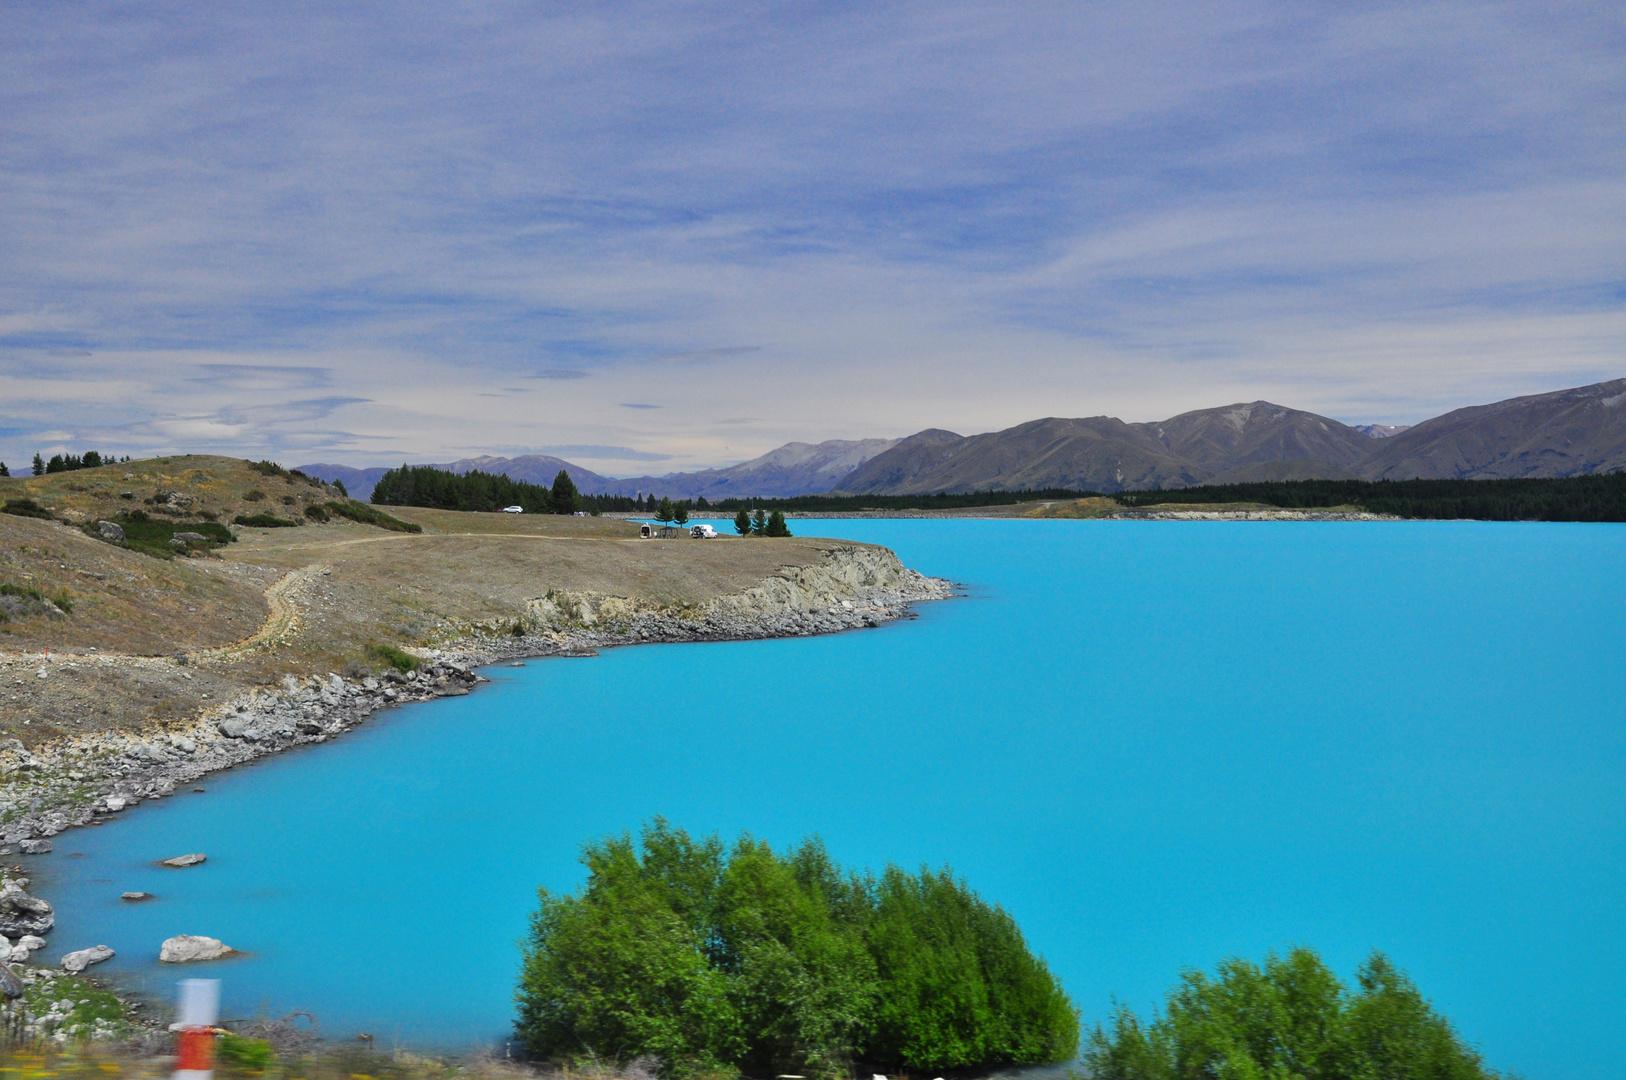 Lake Pukaki aus dem Auto-Dieses unglaubliche Blau!